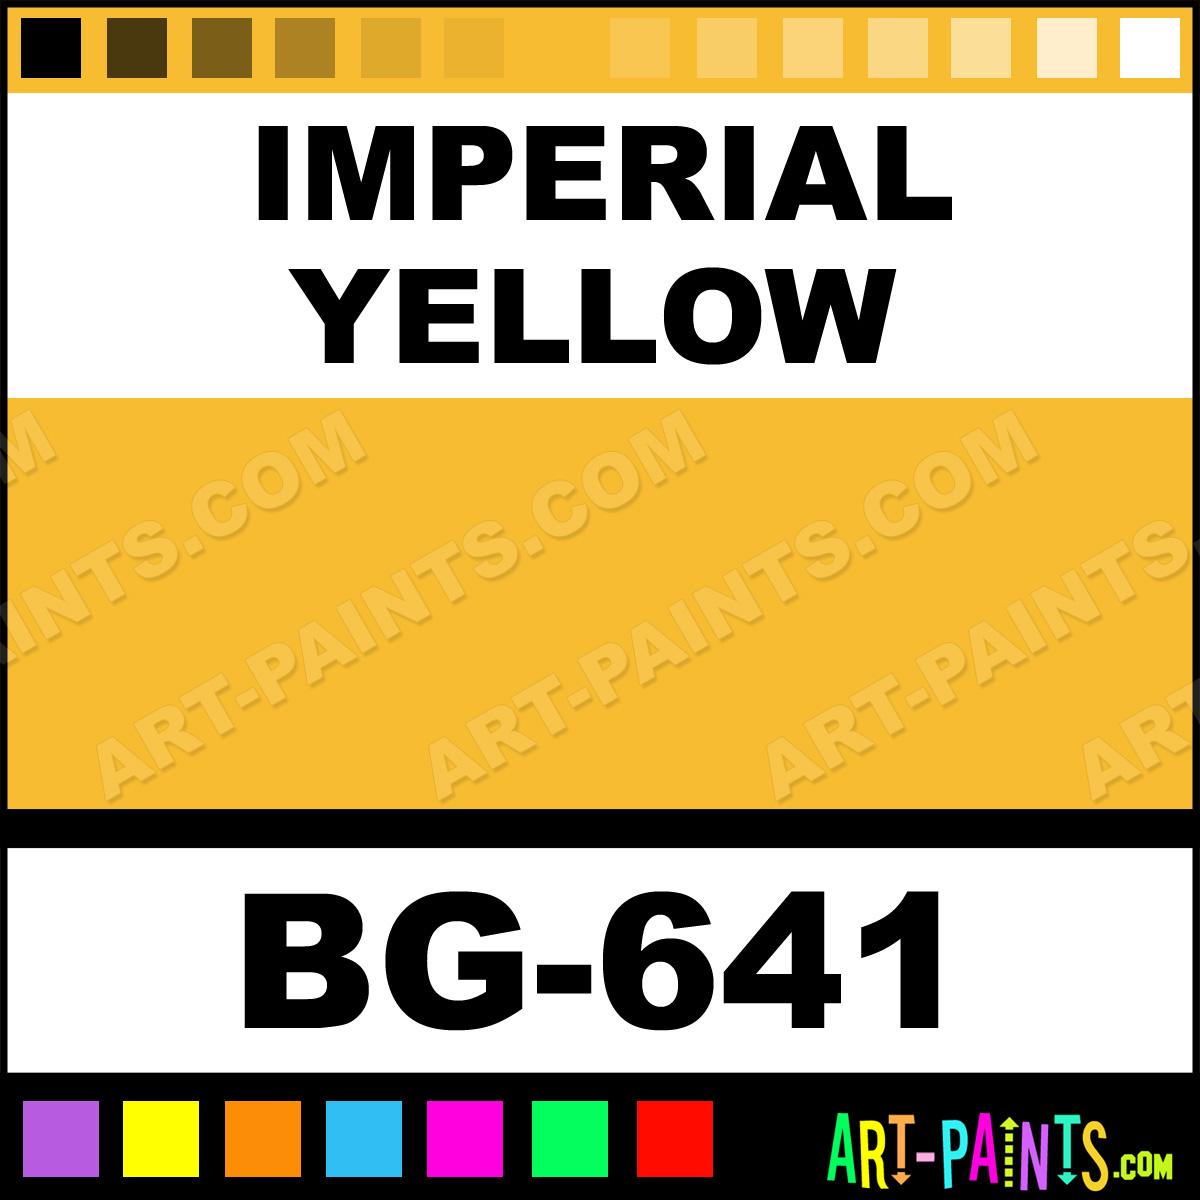 Imperial Yellow Bisque Glaze Ceramic Paints Bg 641